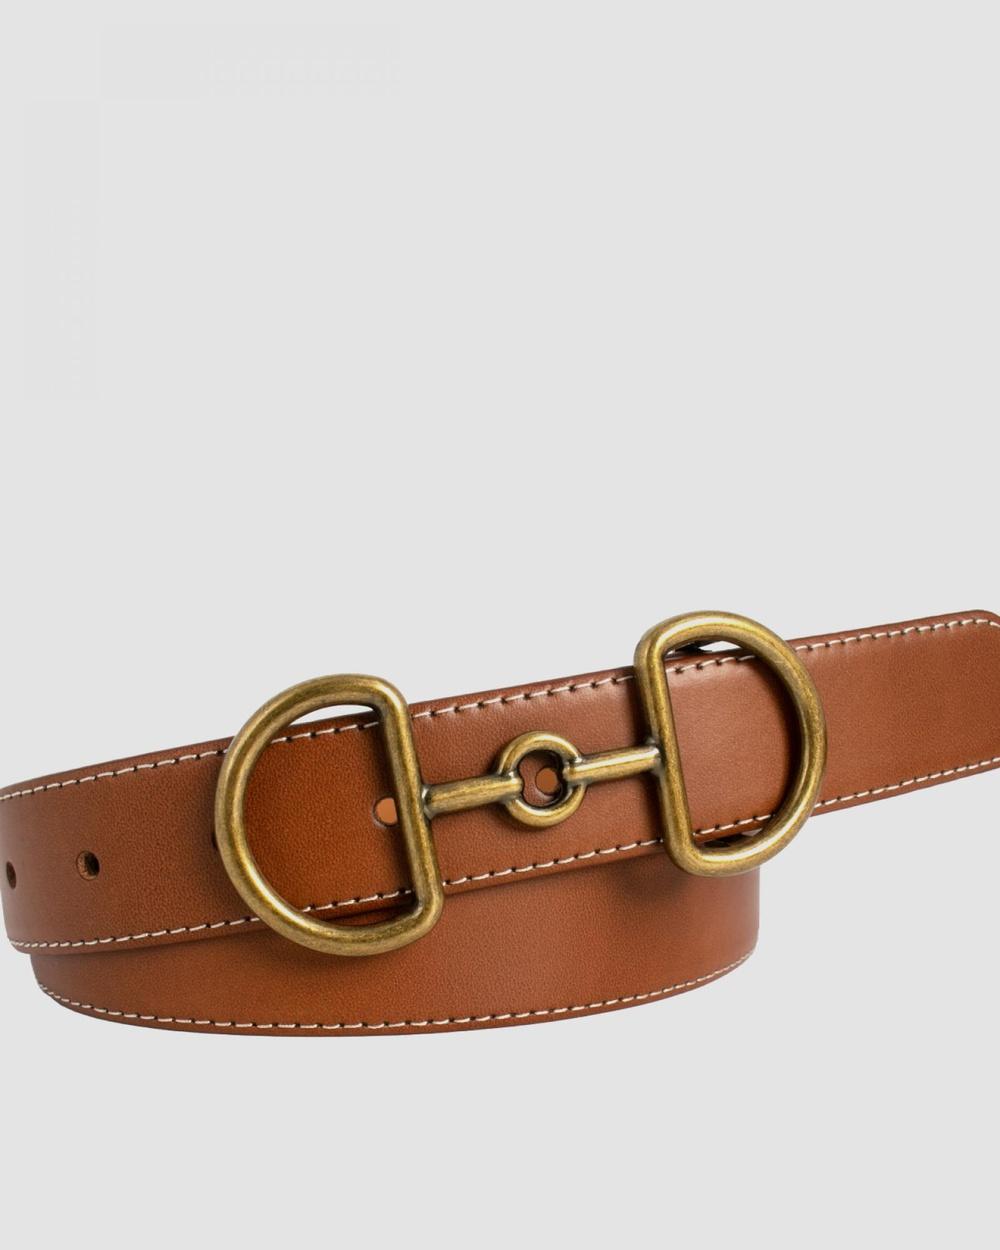 Loop Leather Co Bonny Belts Tan